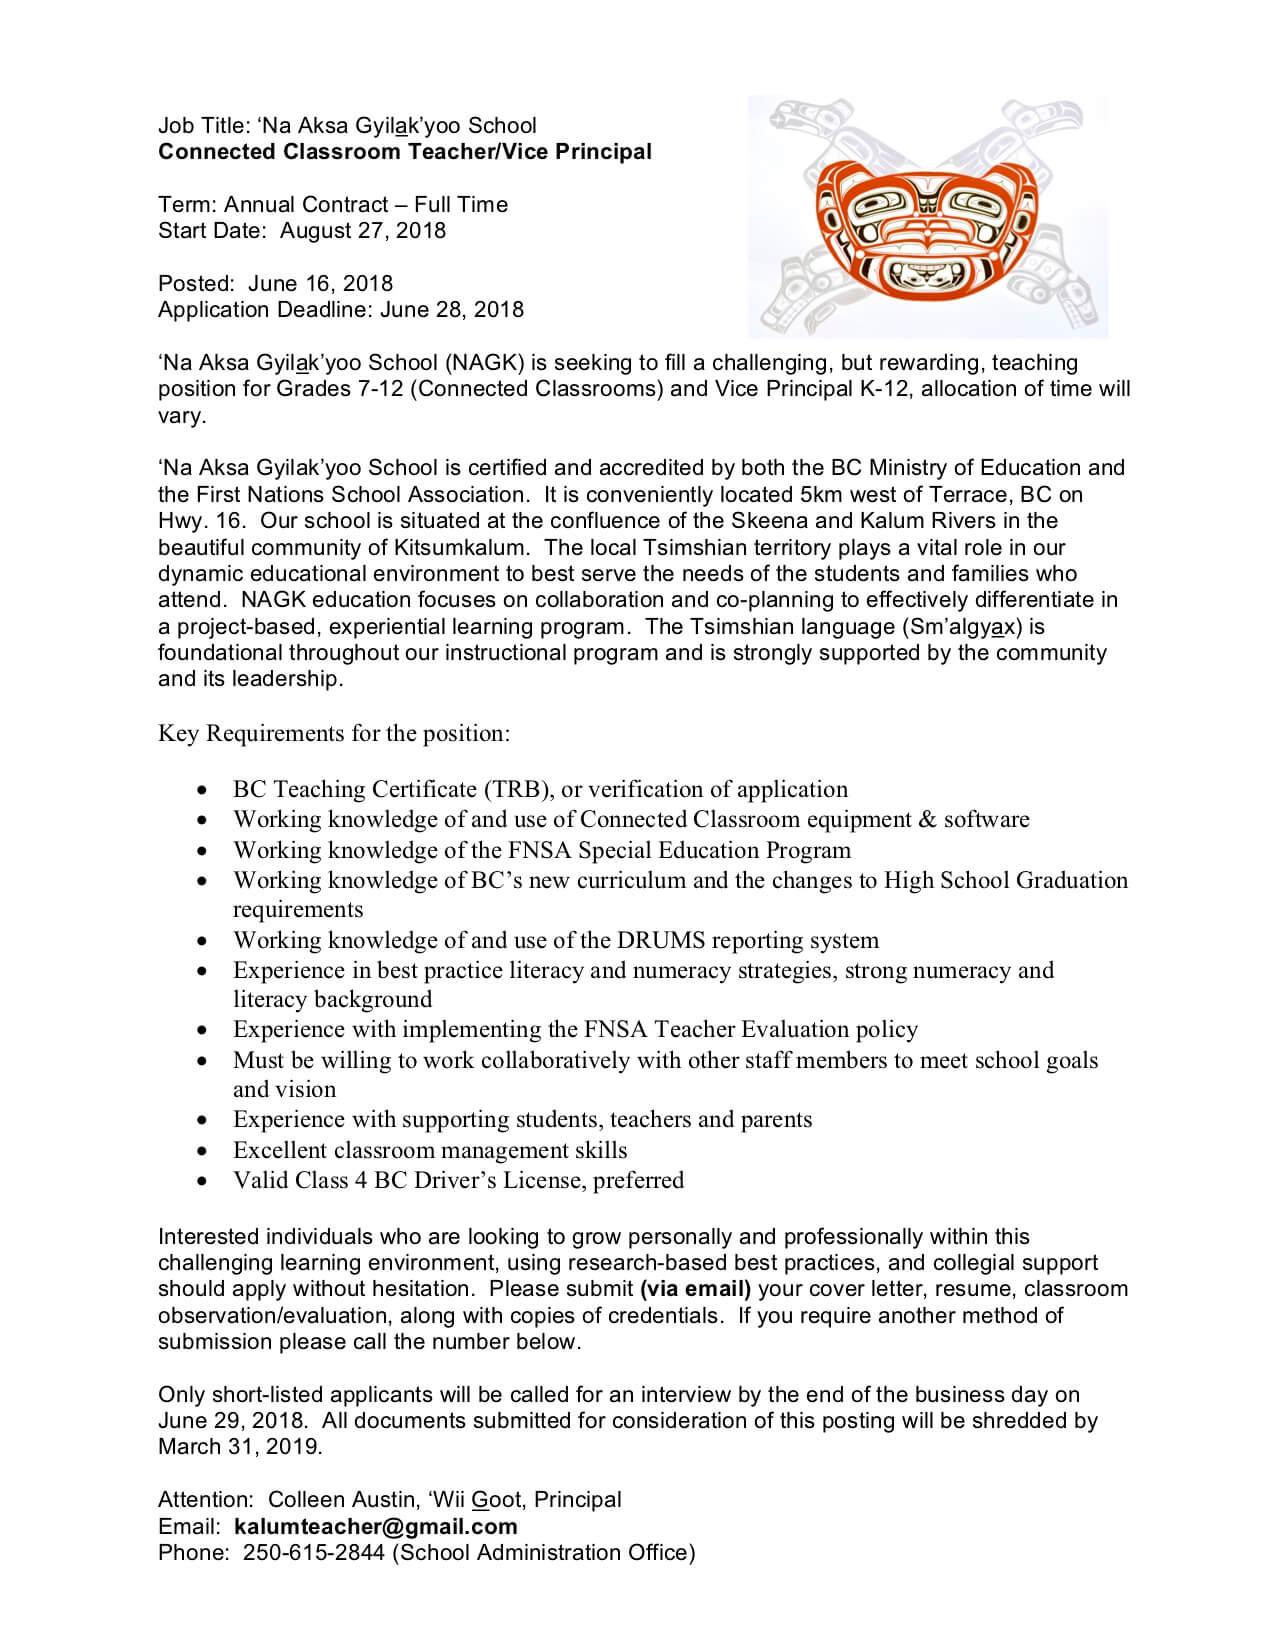 Job Post: Connected Classroom Teacher/Vice Principal